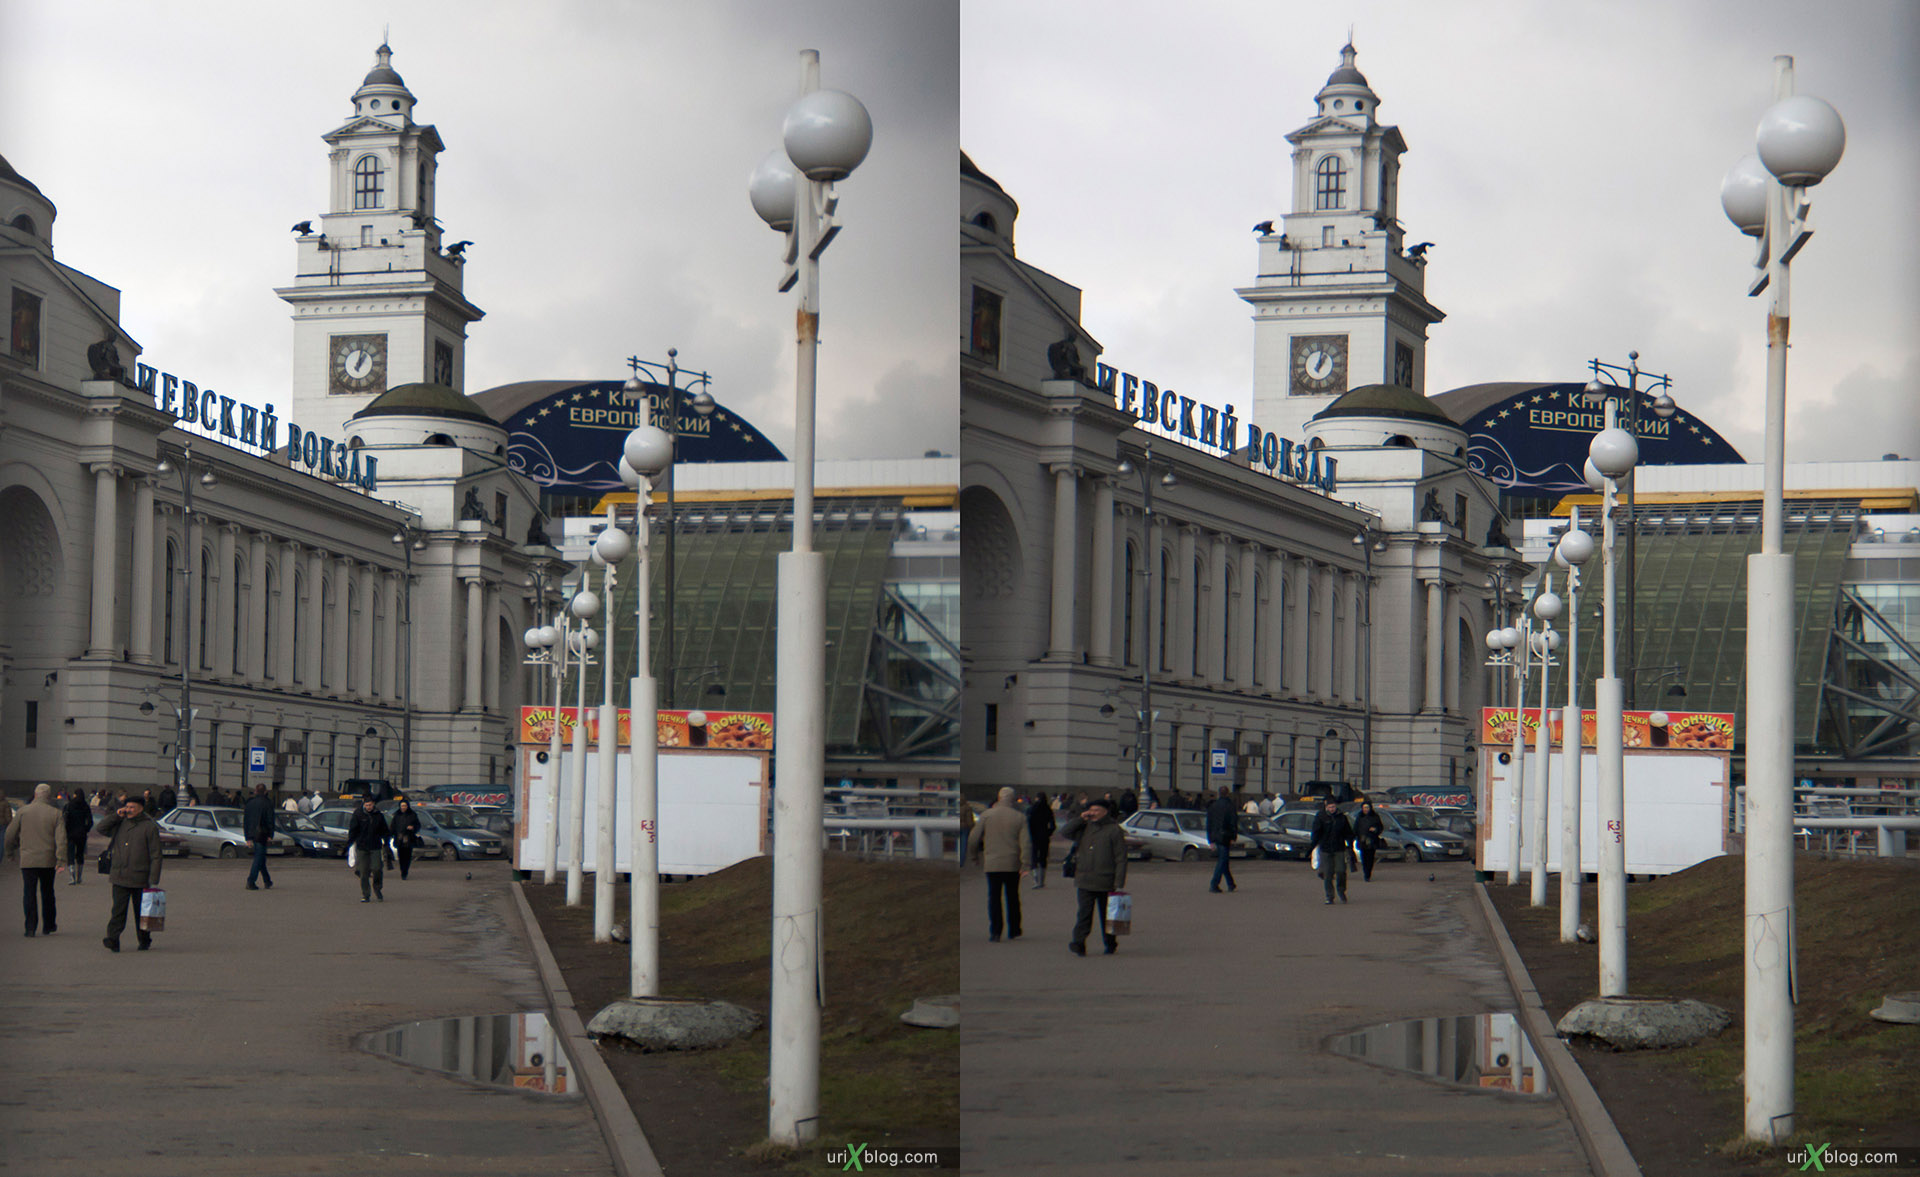 Loreo 3D lens in a cap стерео, стереопара Moscow, Kievsky railway station, Москва, Киевский вокзал, stereo, стерео, cross-eyed, 3D